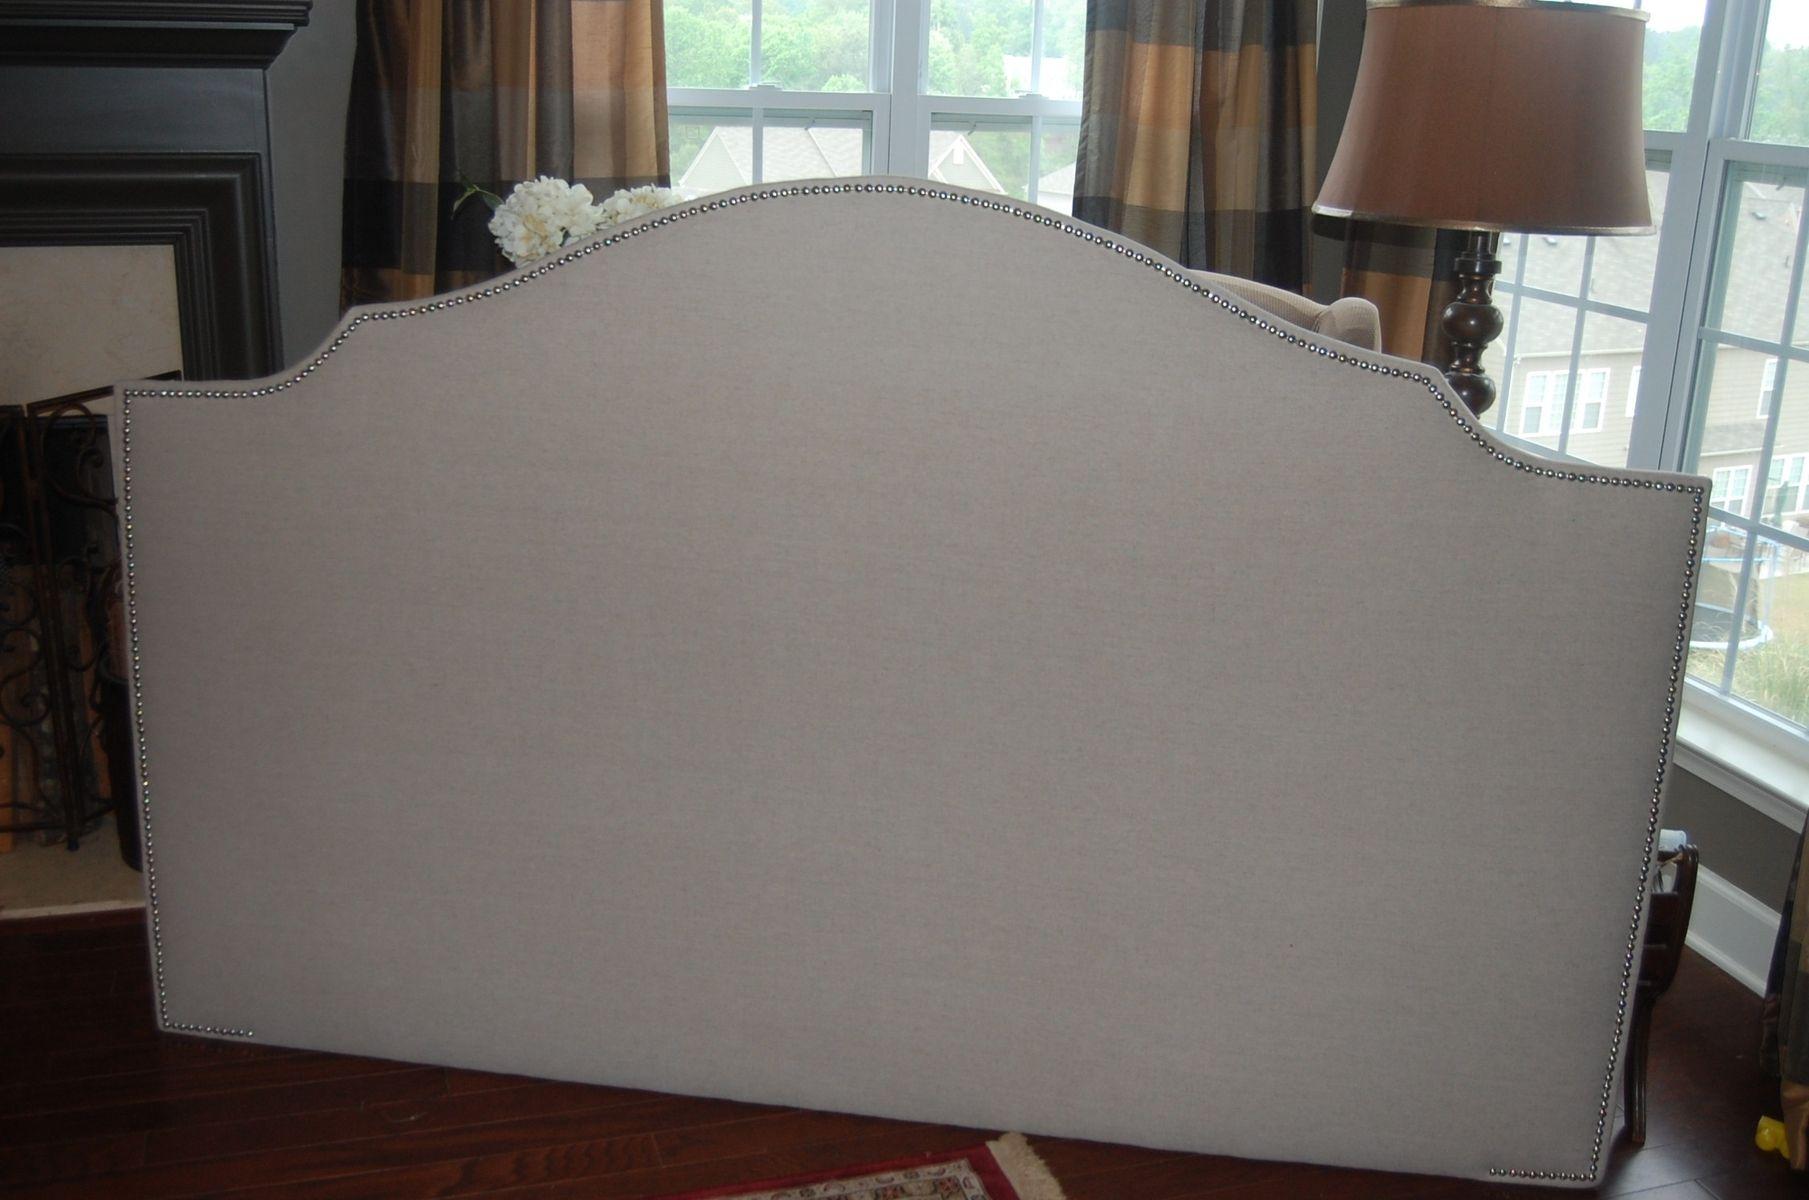 Custom Upholstered Headboards custom notched upholstered headboard, natural linen, silver nickel